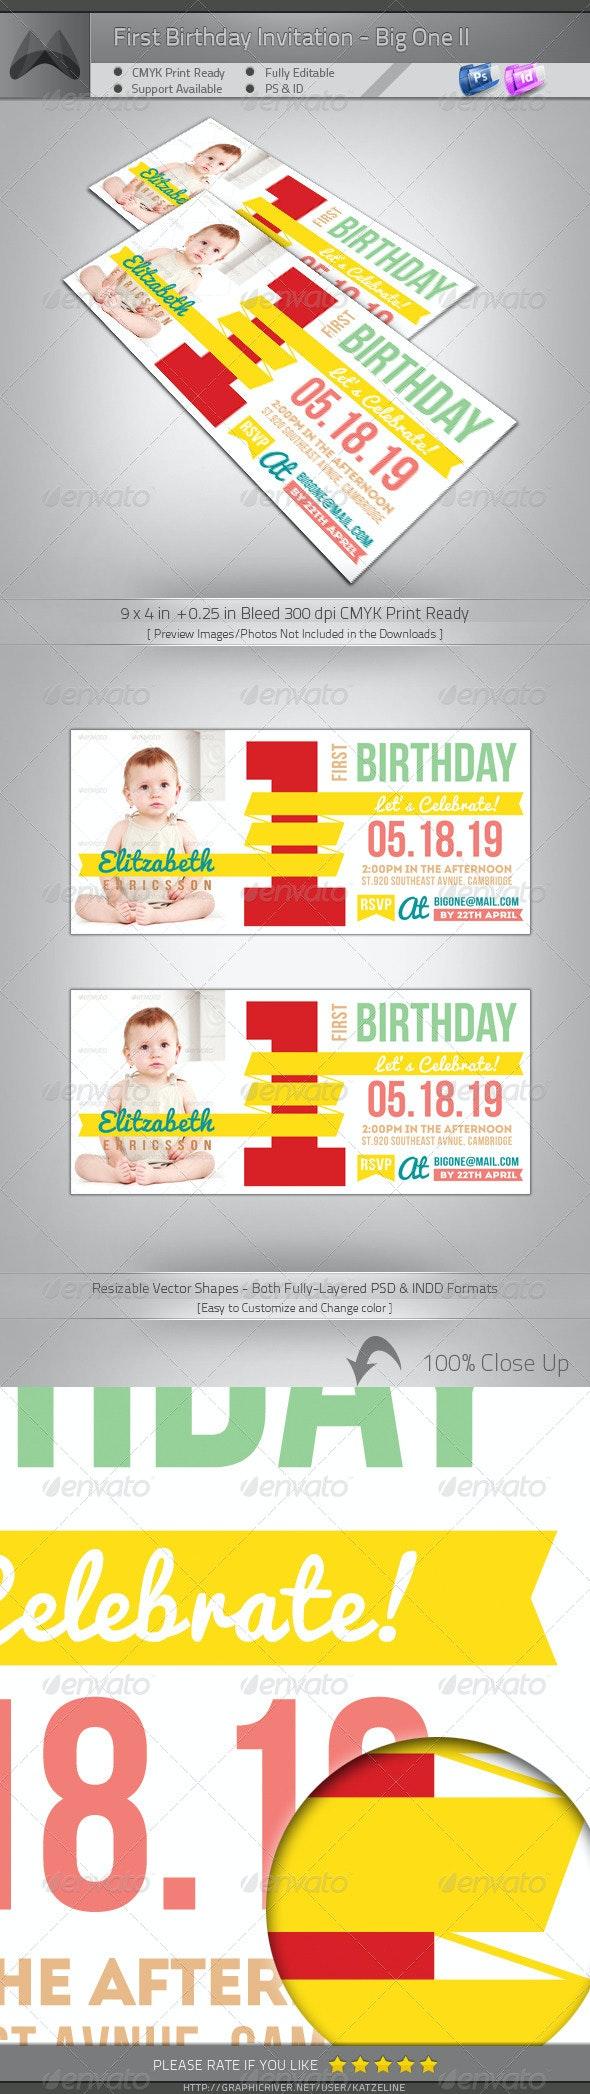 First Birthday Invitation - Big One II - Birthday Greeting Cards